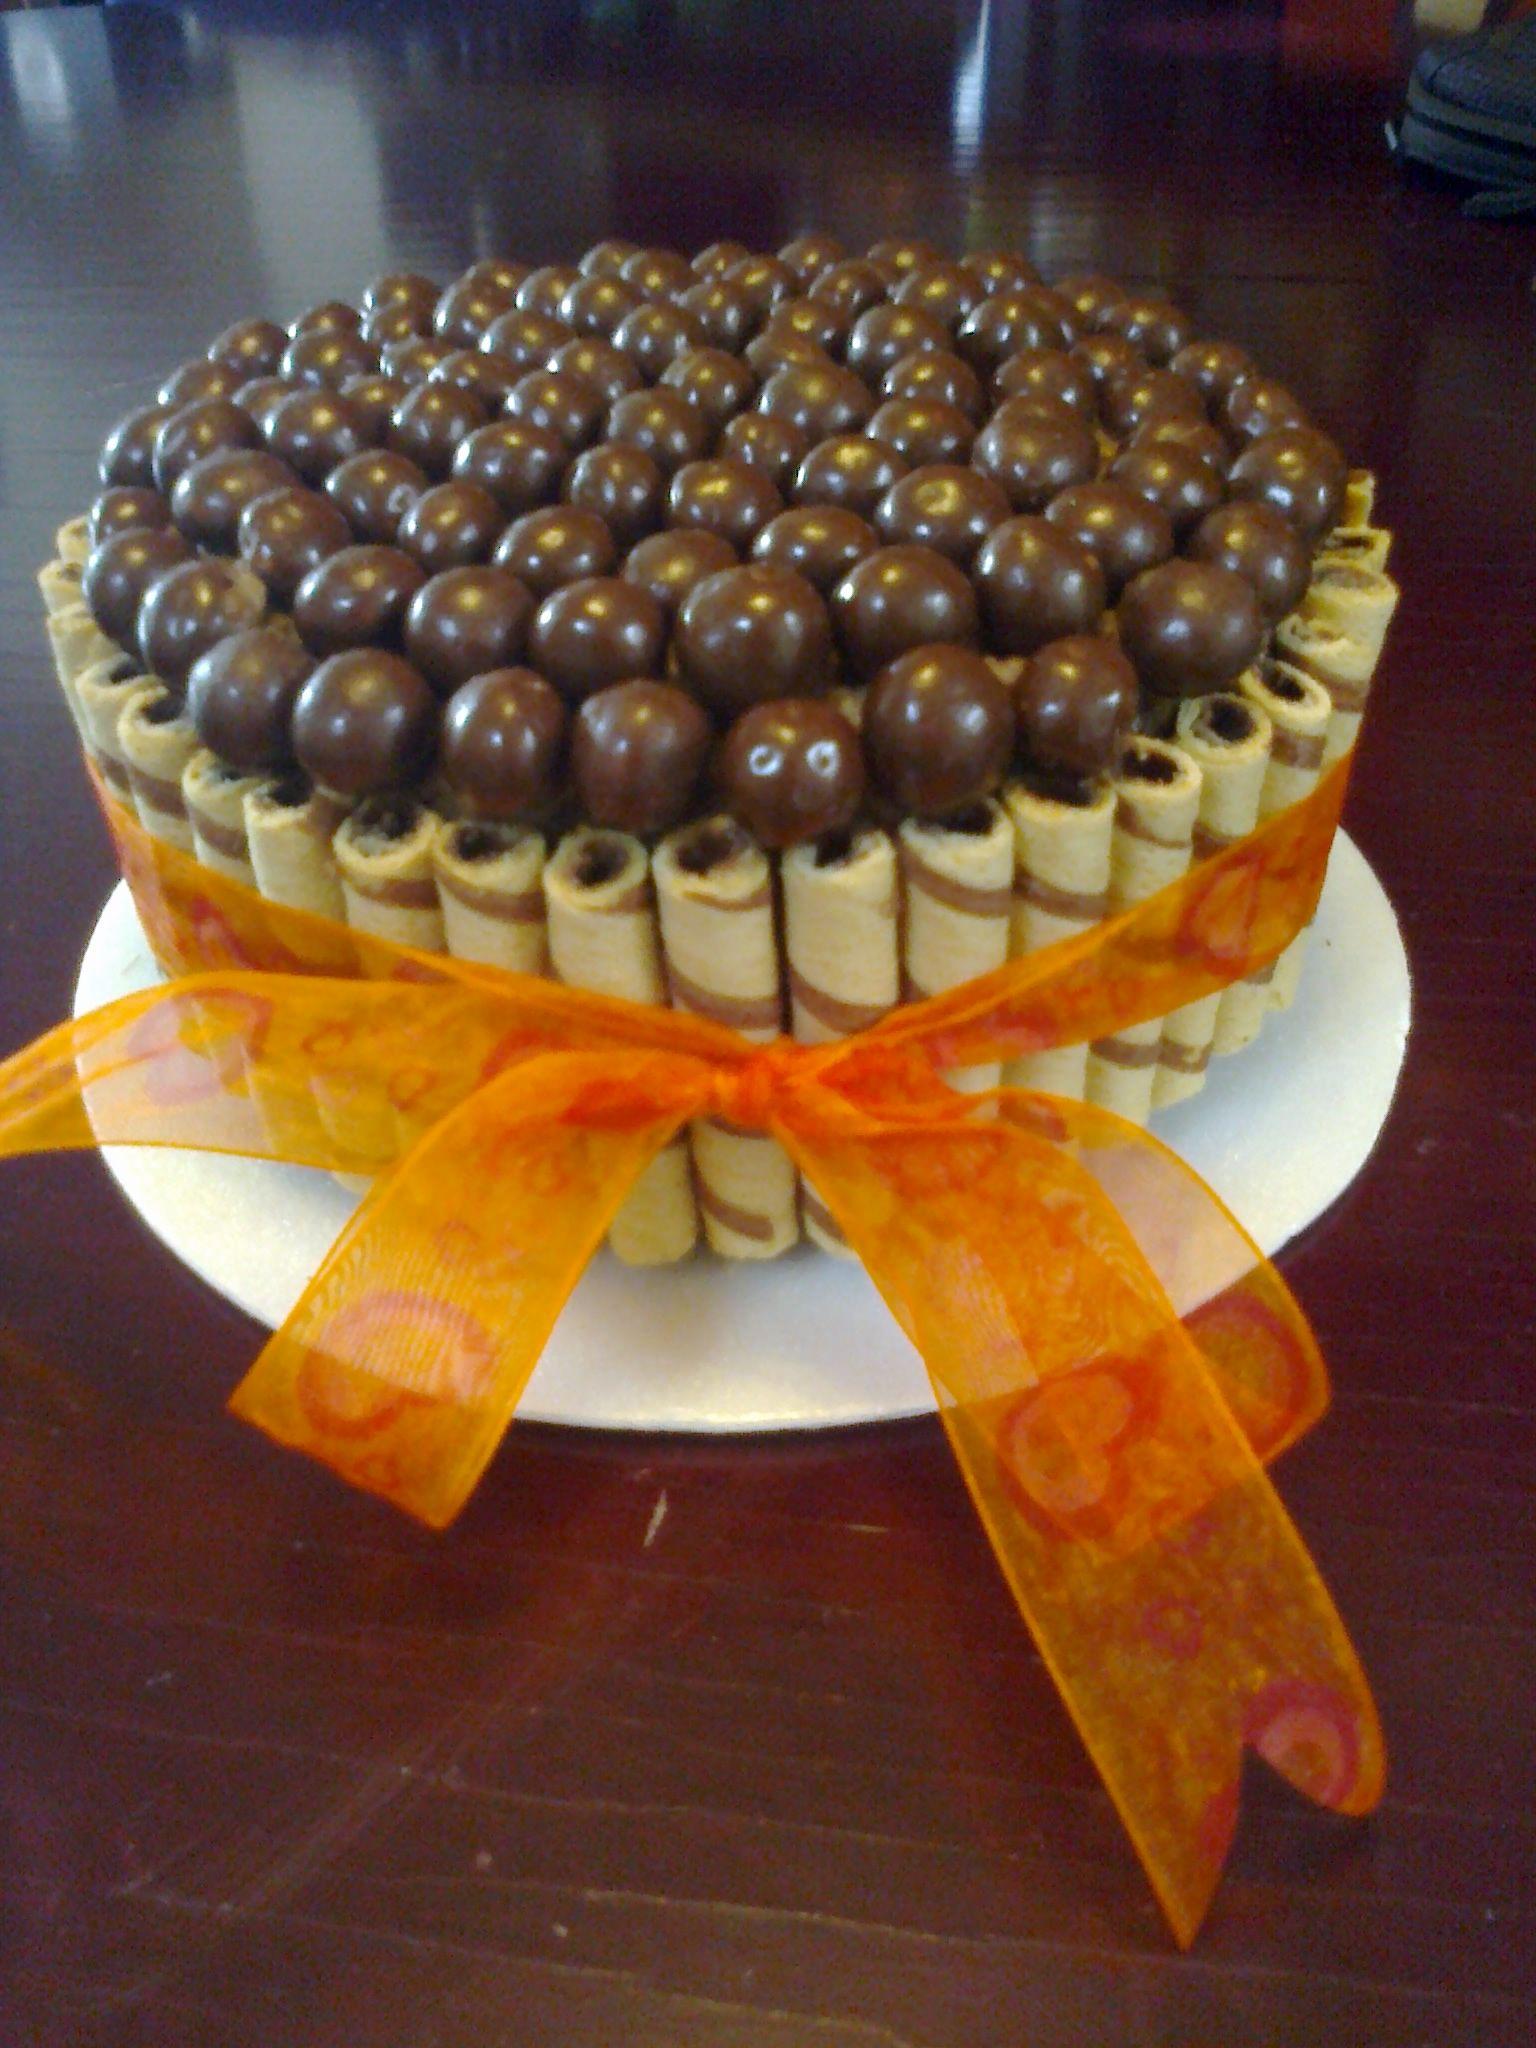 Rica Tarta De Chocolate Decorada Con Bolitas De Chocolate